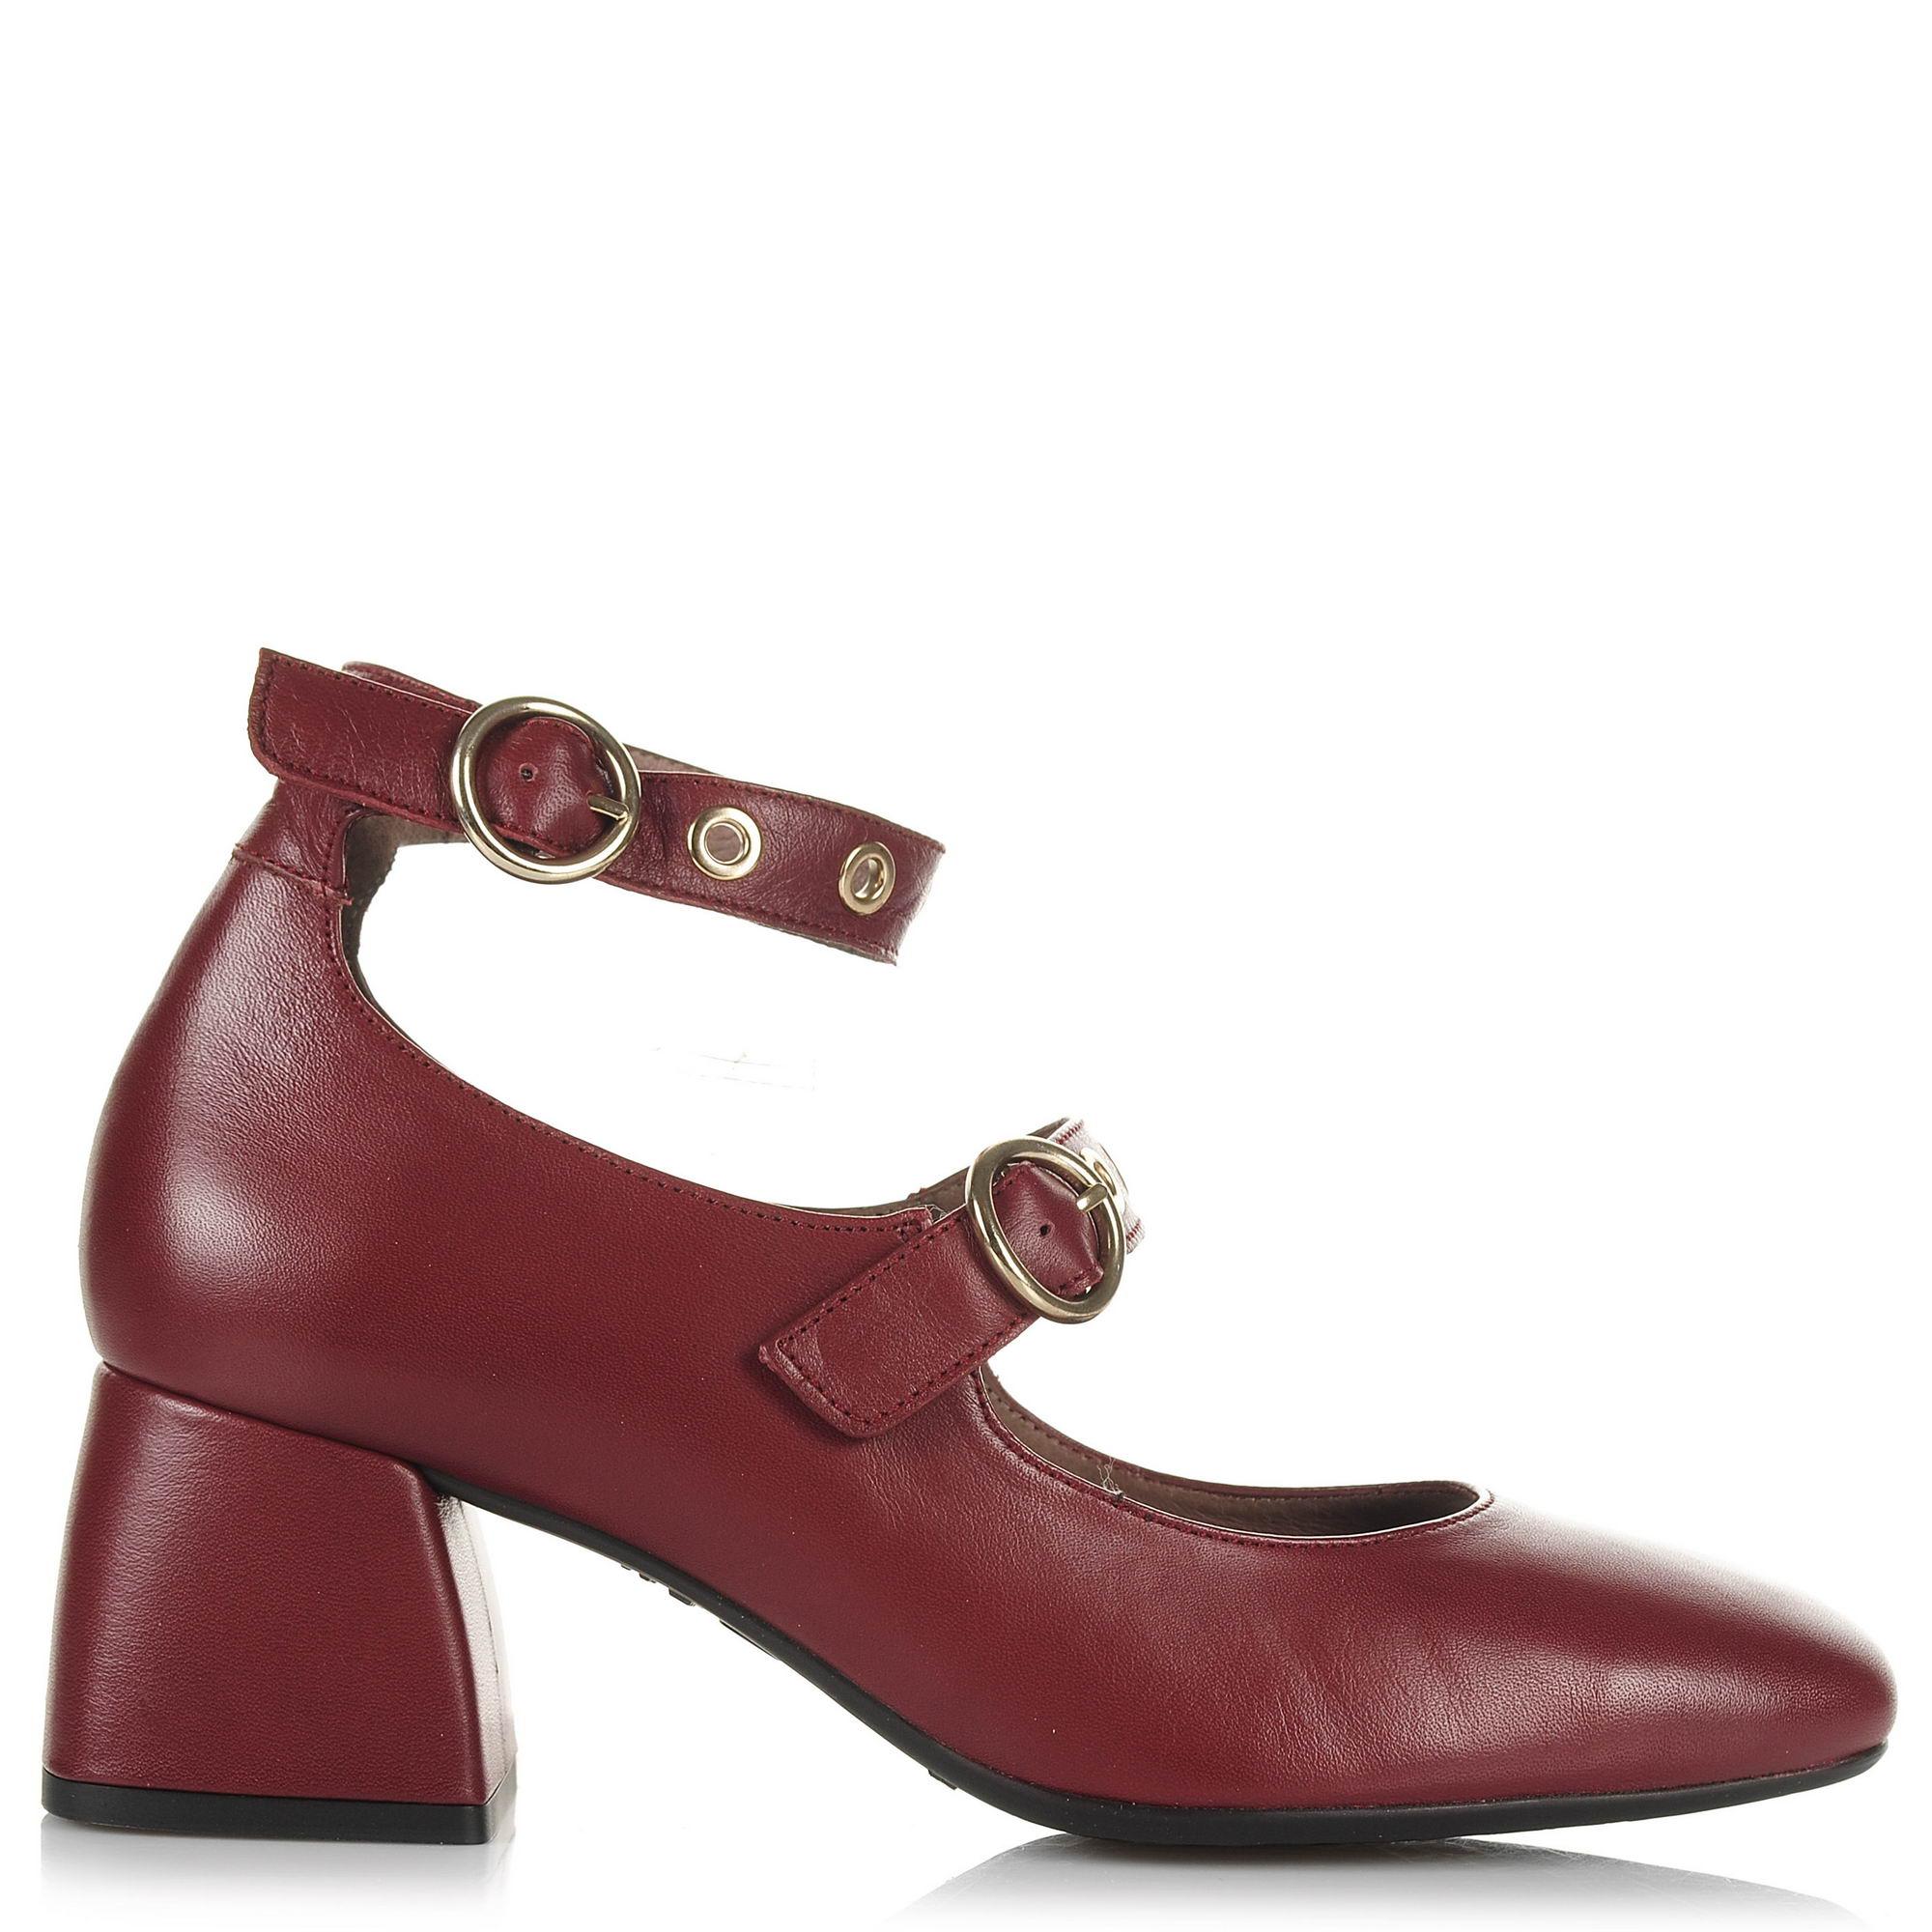 6b500871ae3 WONDERS - Κορυφαία προϊόντα για Γυναικεία Παπούτσια   Outfit.gr